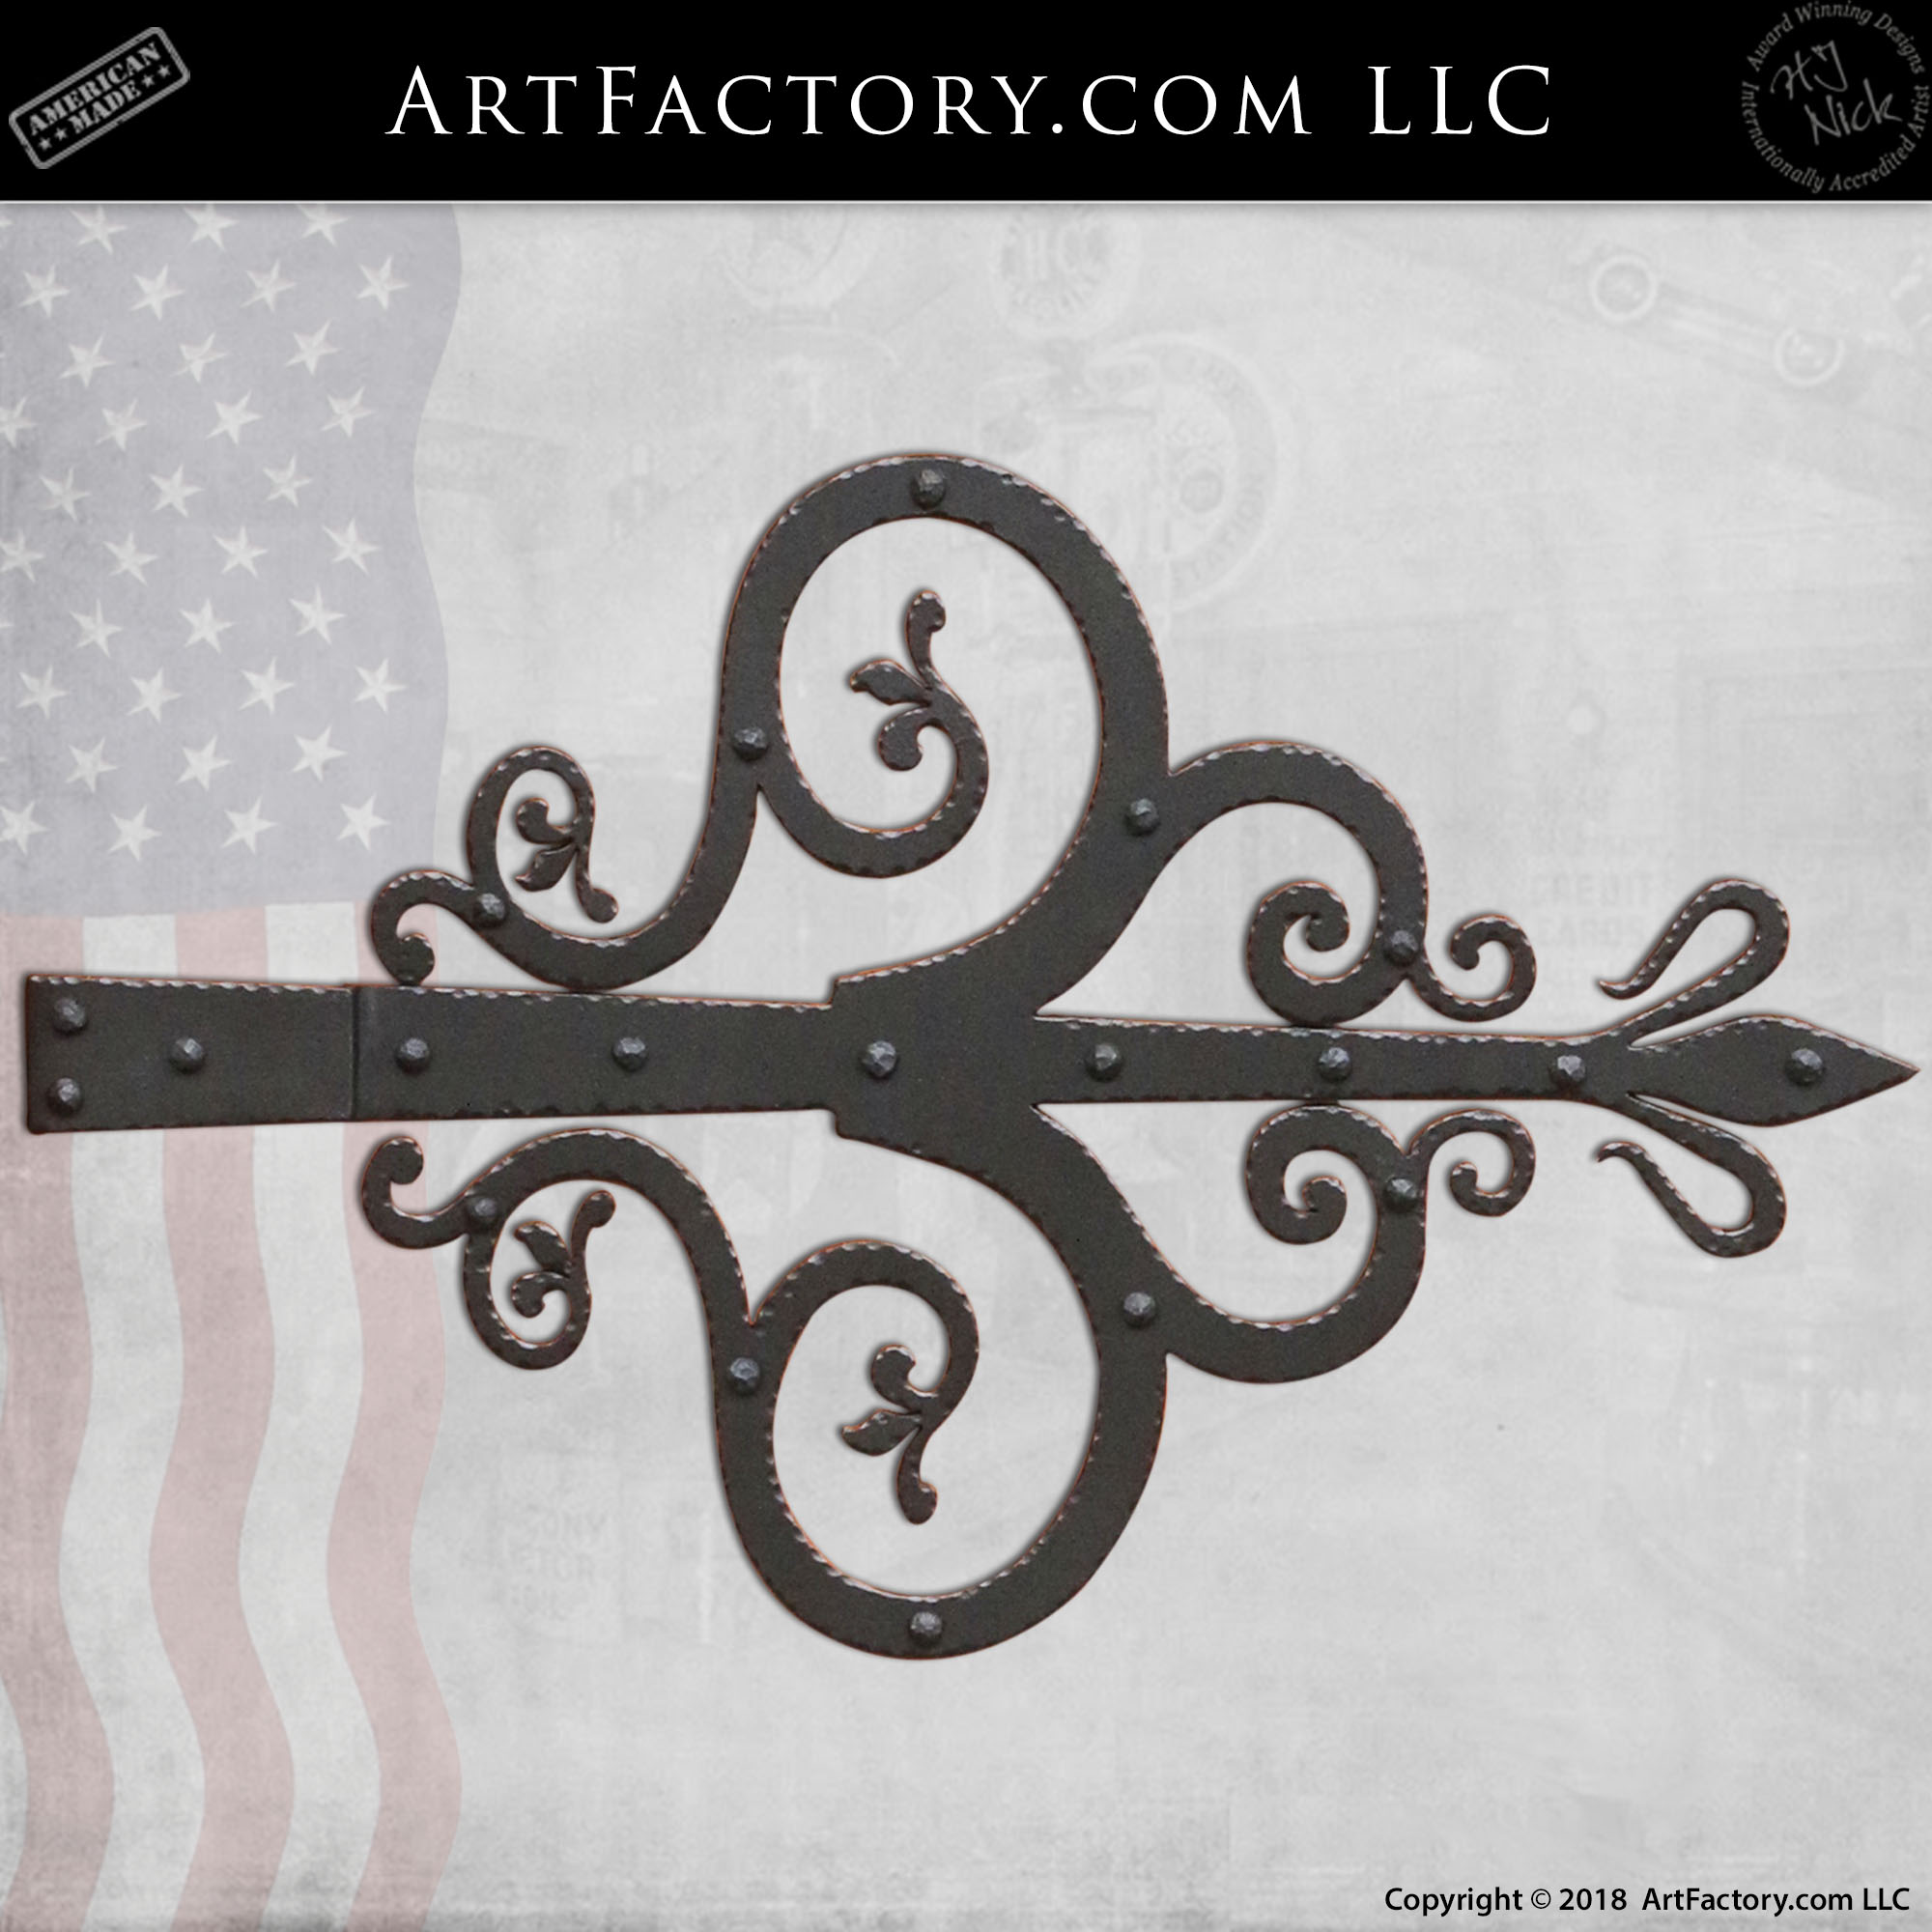 fine art decorative strap hinge